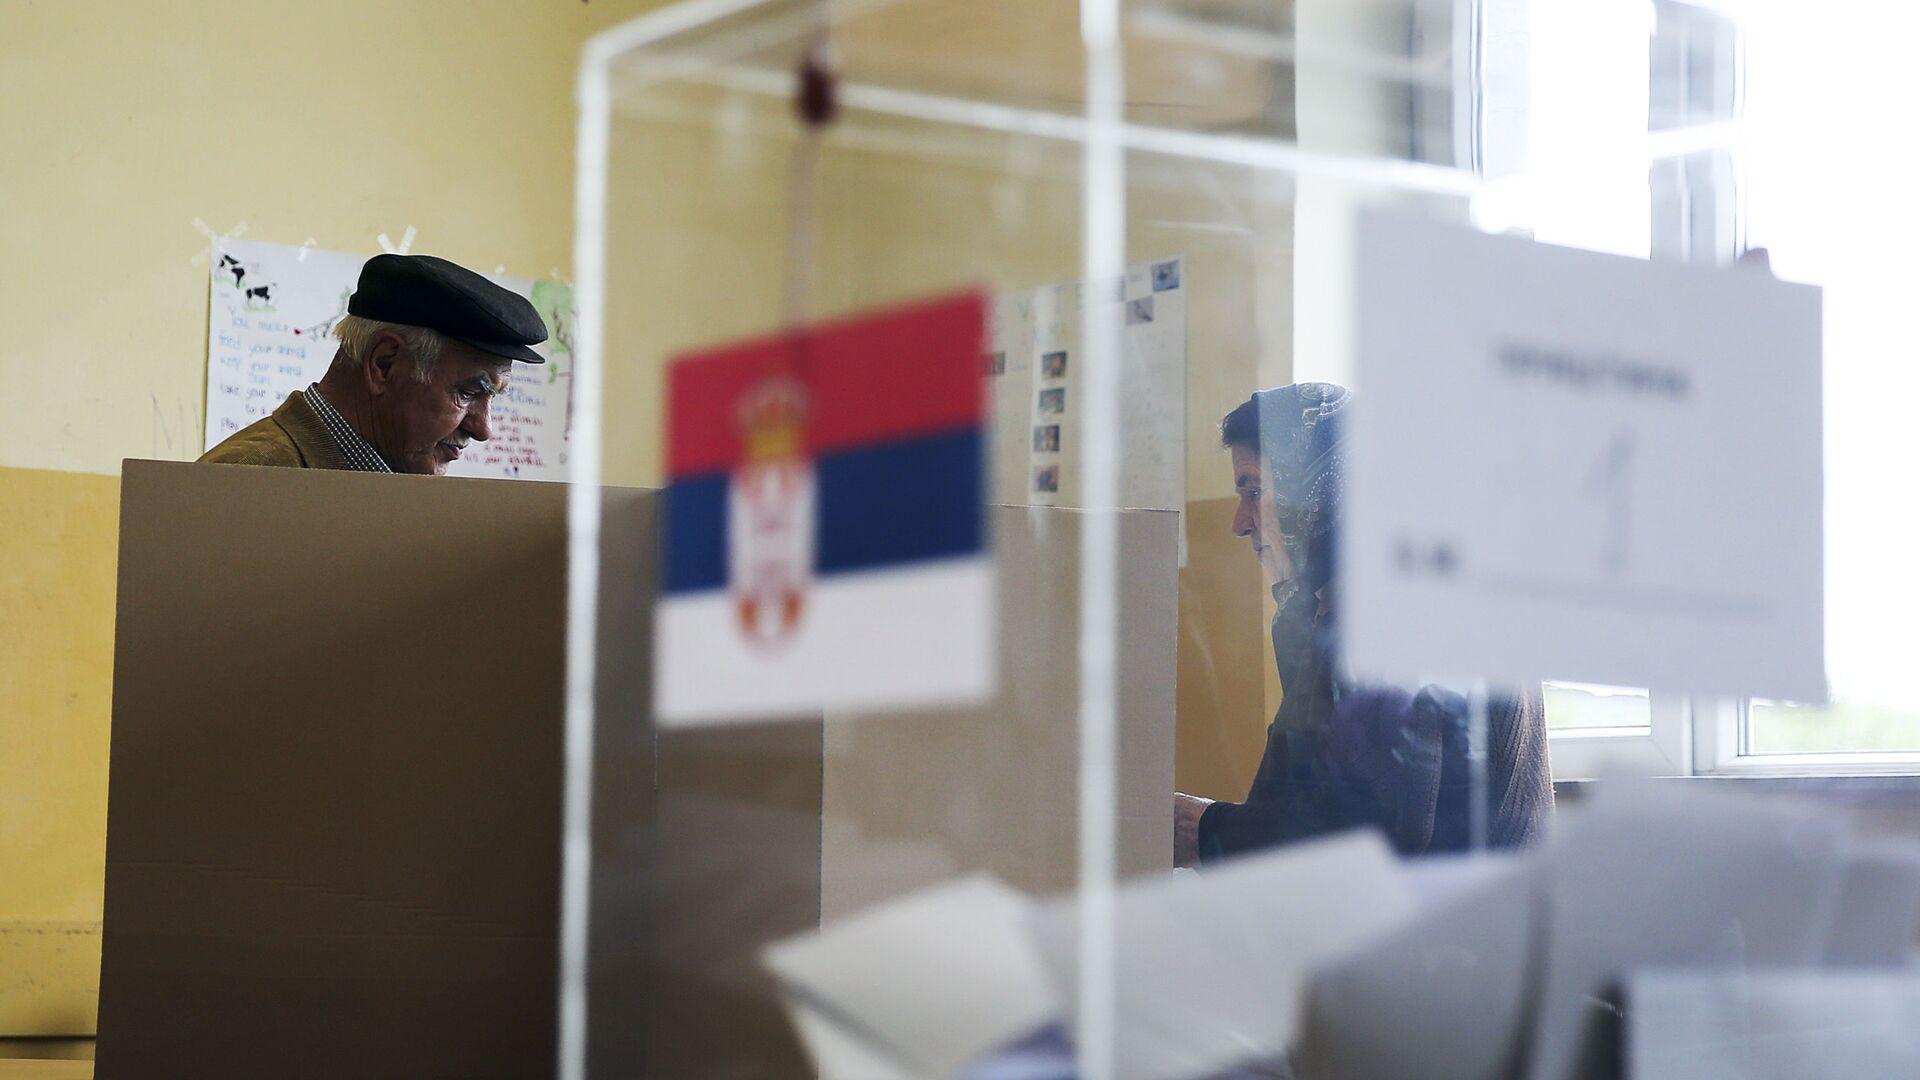 Србија, избори - Sputnik Србија, 1920, 08.09.2021